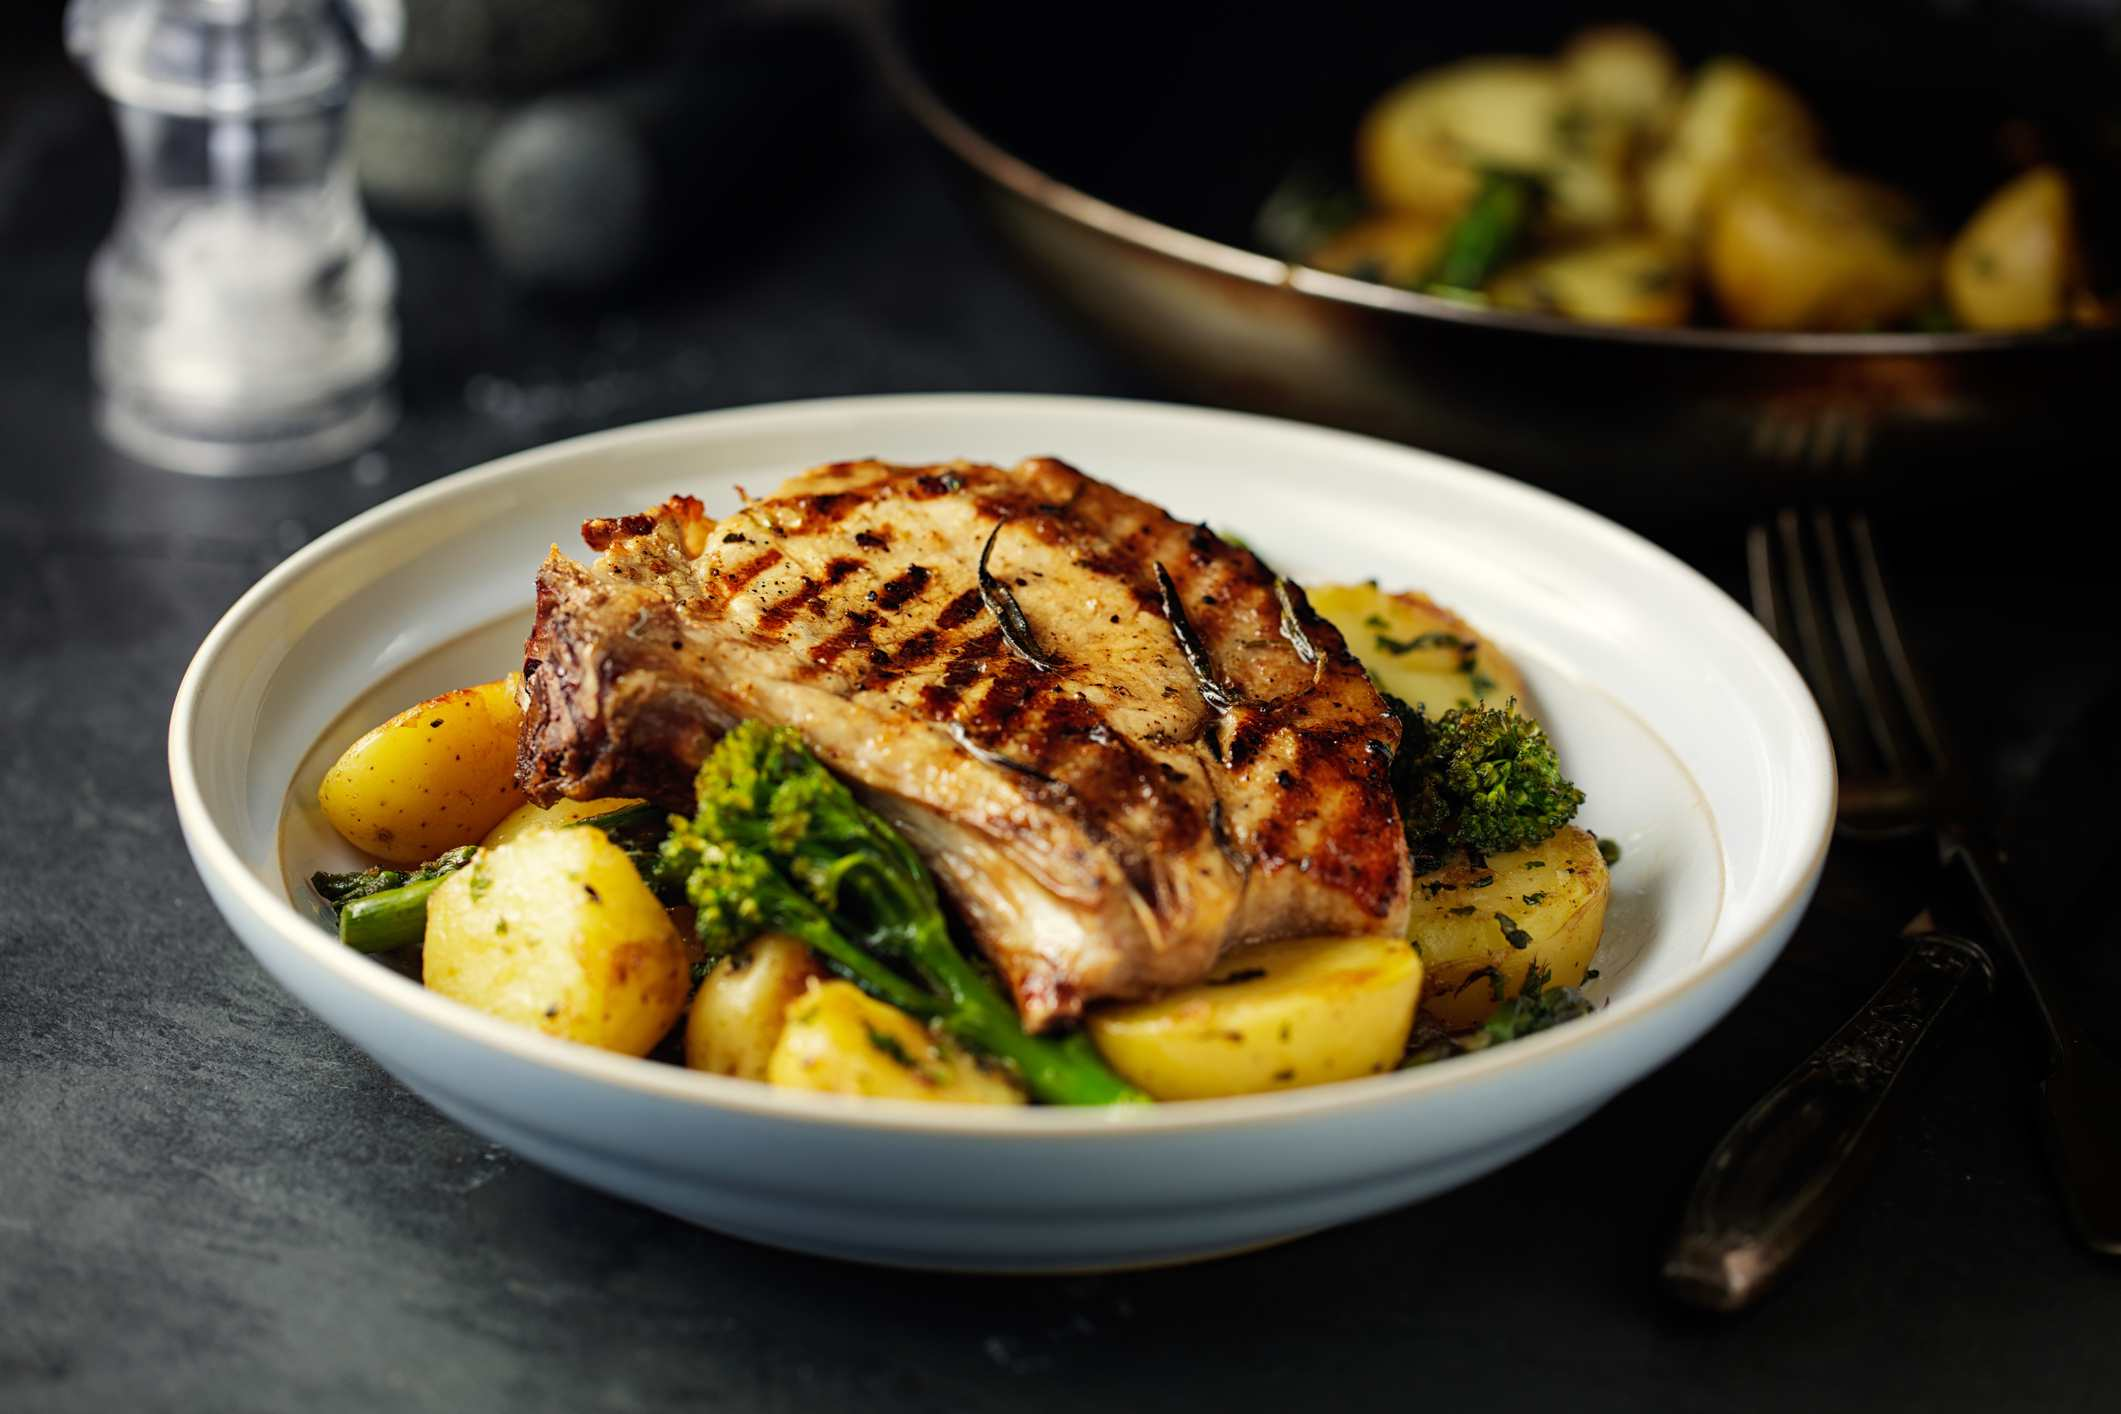 grilled pork chop with garlic sauté potatoes